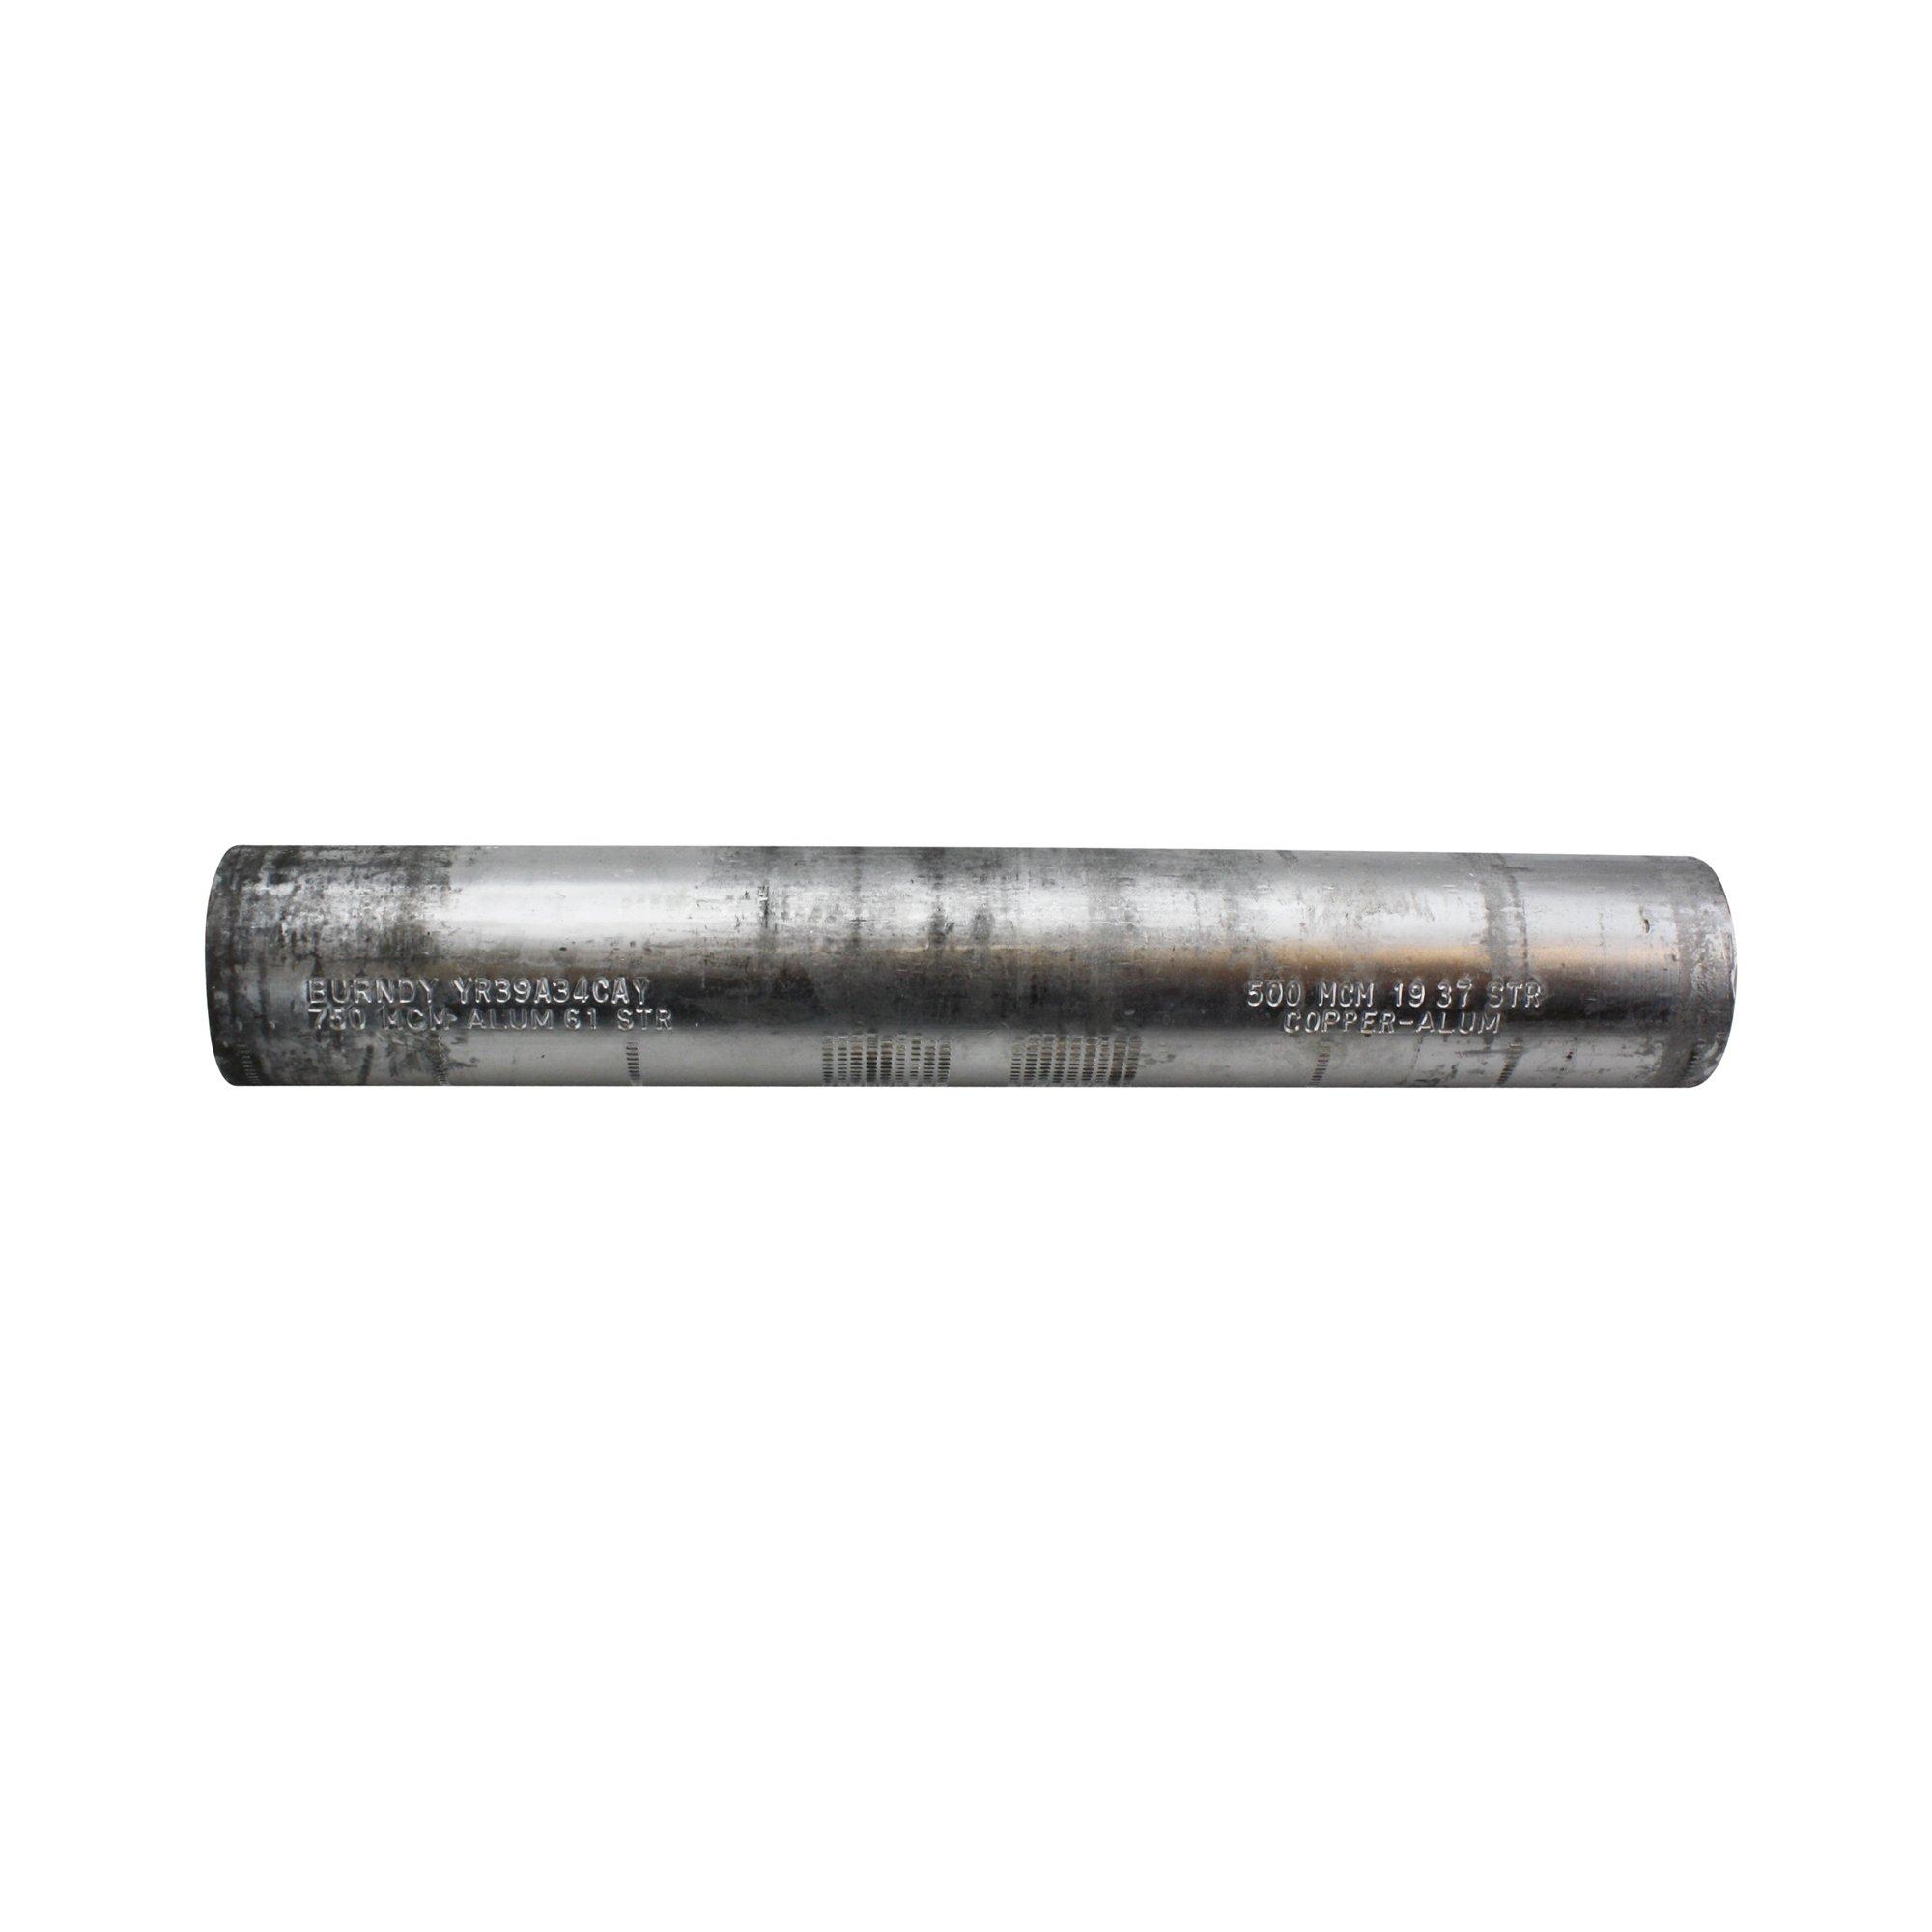 Burndy YR39A34CAY Aluminum Reducing Splice Connector for CU/AL, 750CU / 500AL KCMIL